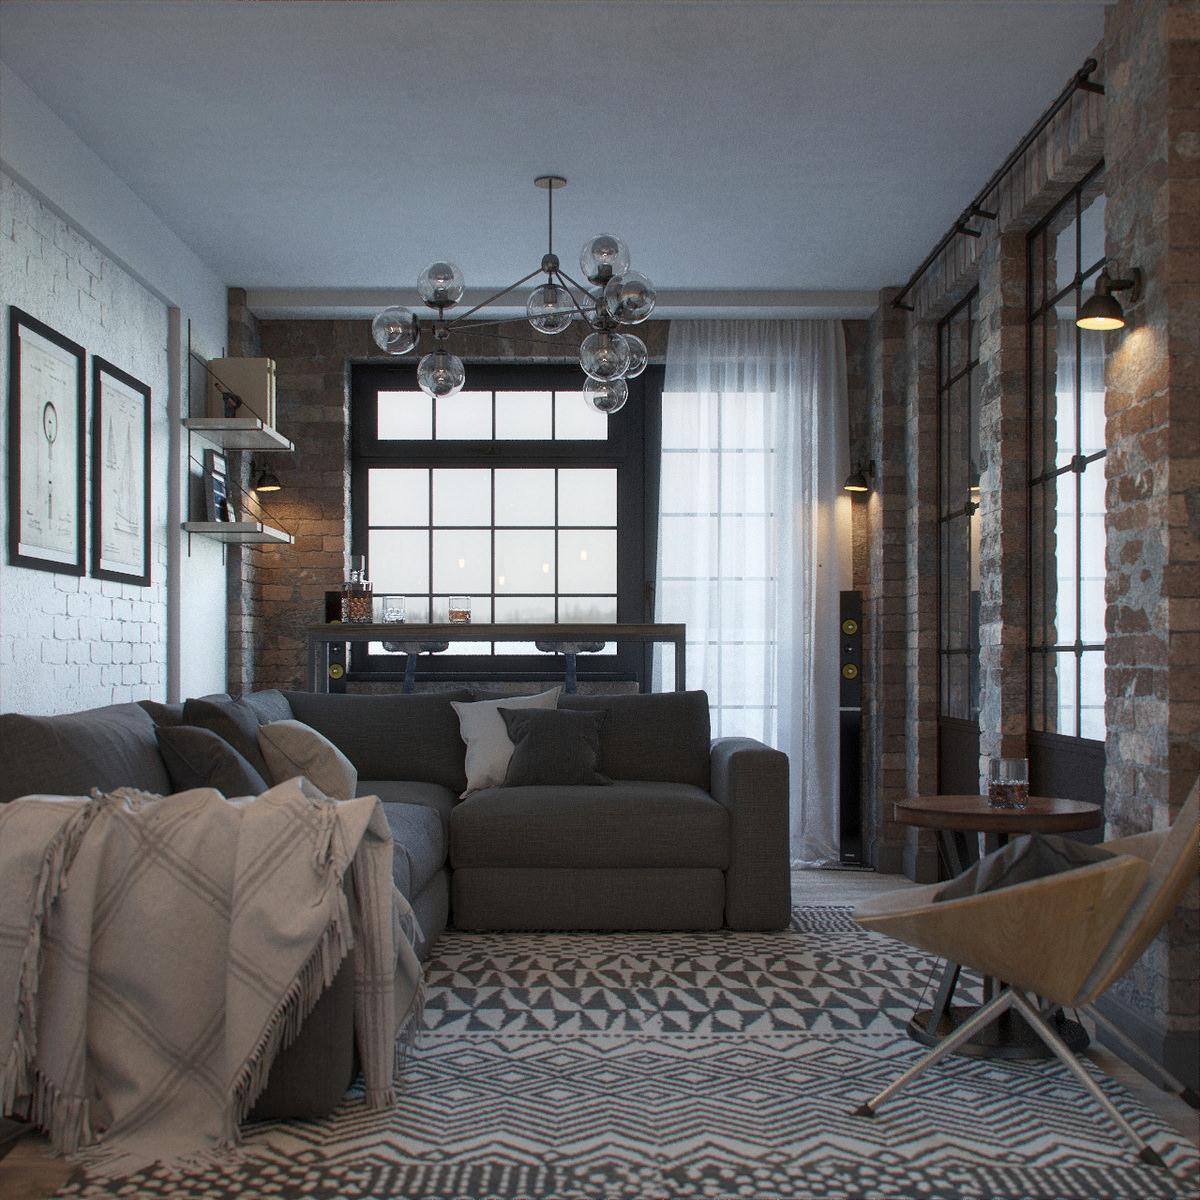 interior-3D-visualization-loft-room-sofa